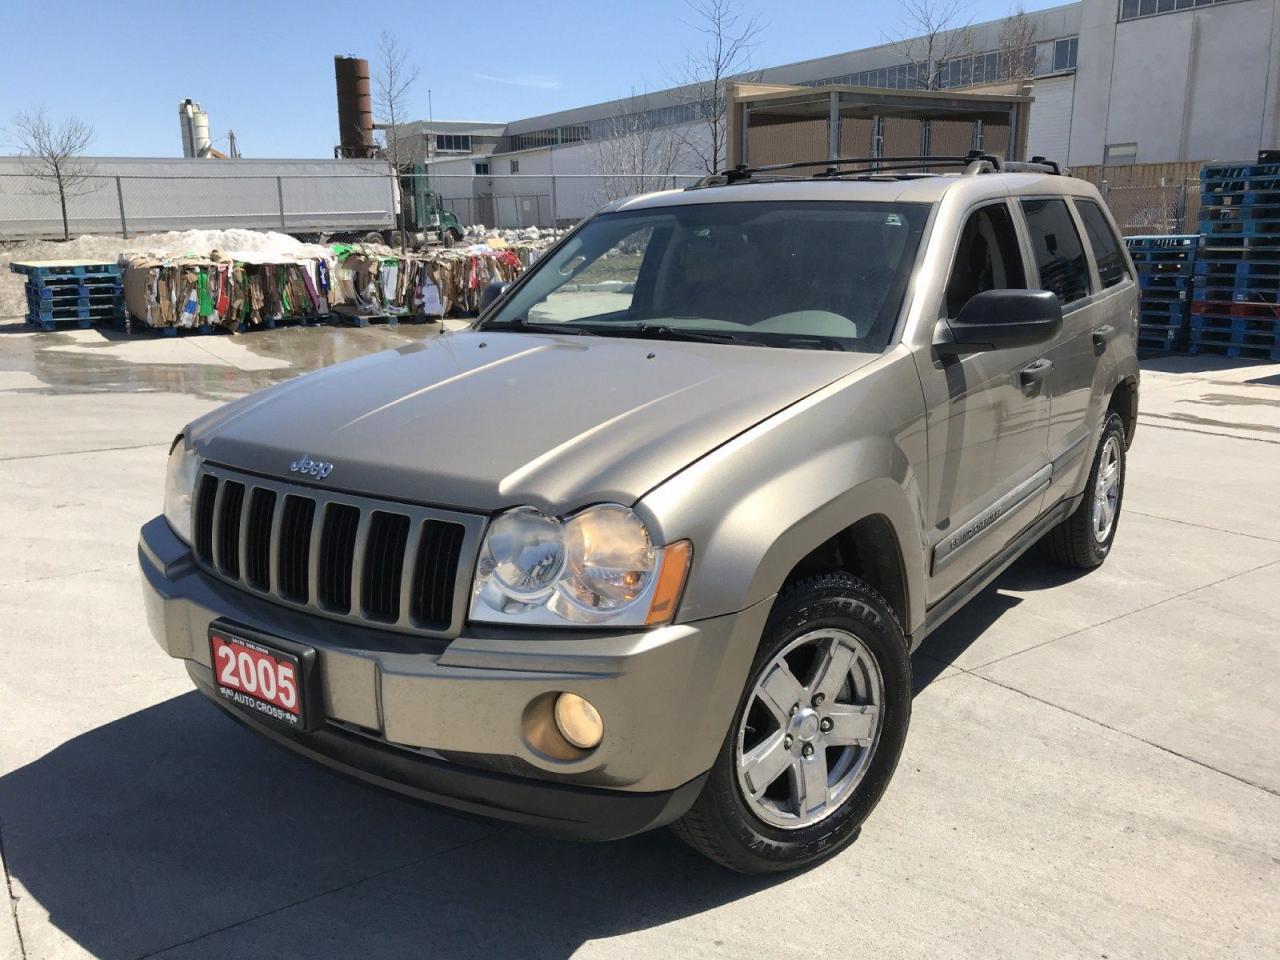 2005 Jeep Grand Cherokee 4x4, Leather Sunroof, Auto, Low km